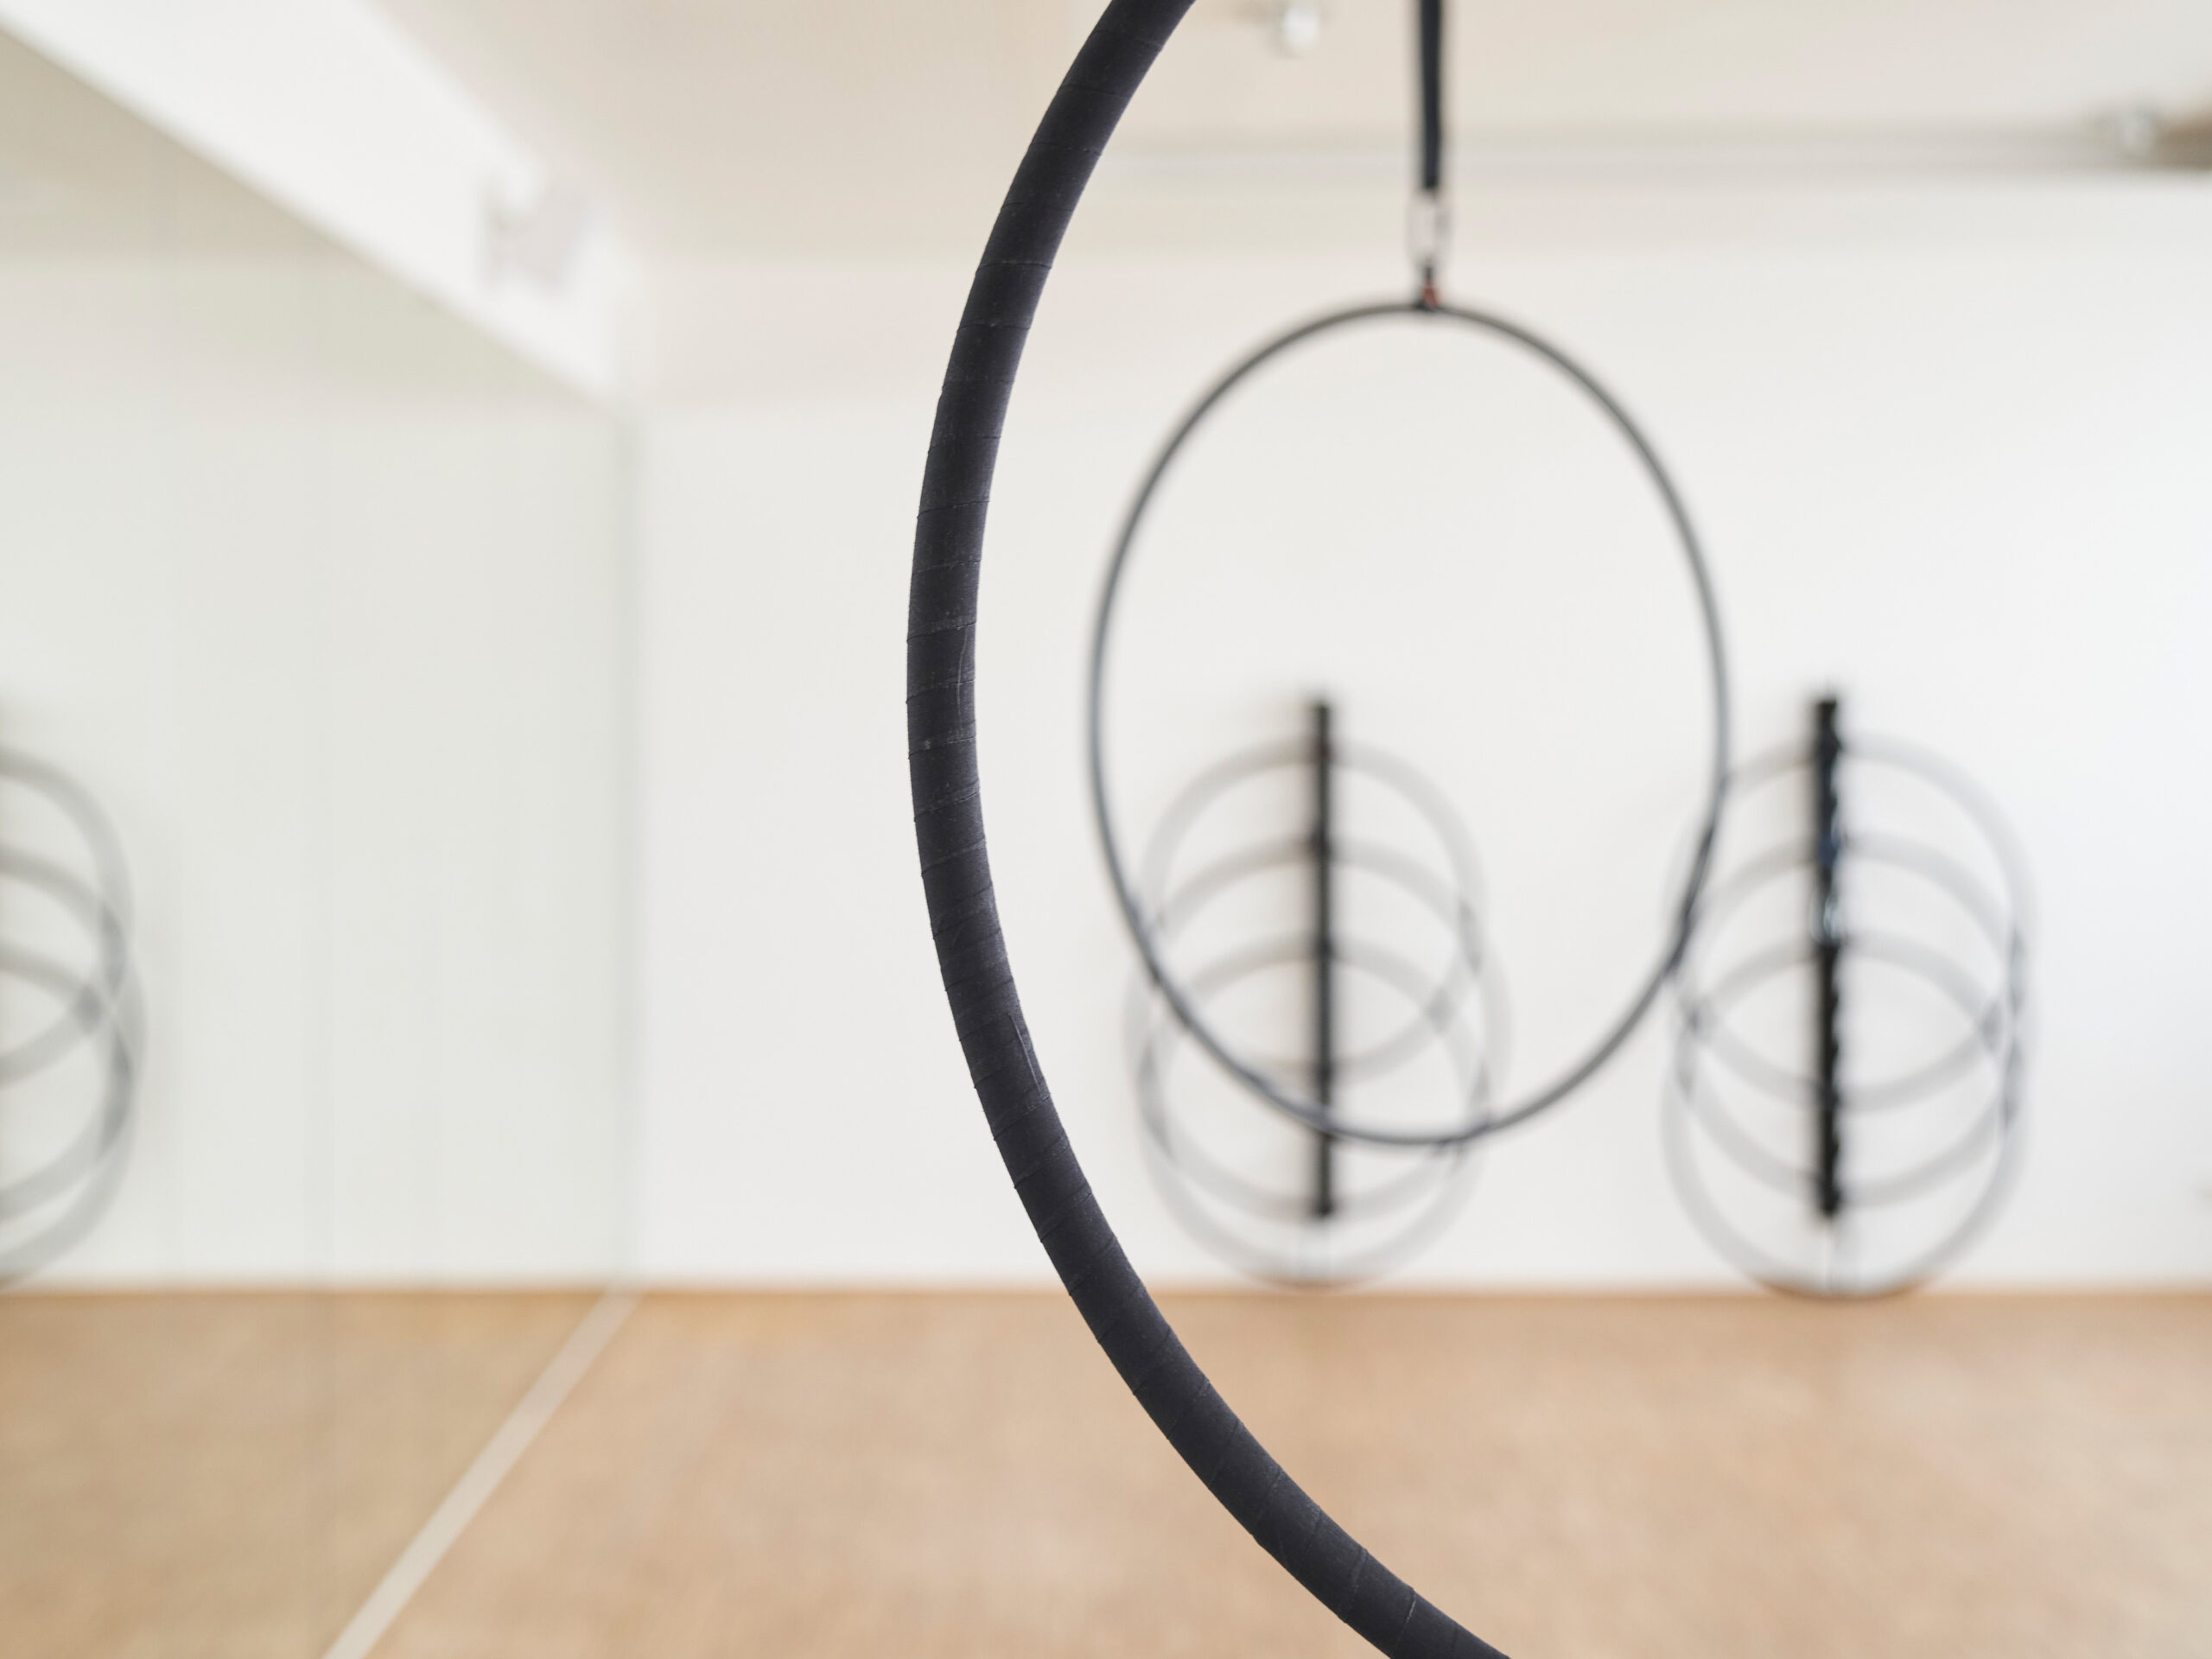 munich-poledance-studio-hoop-01